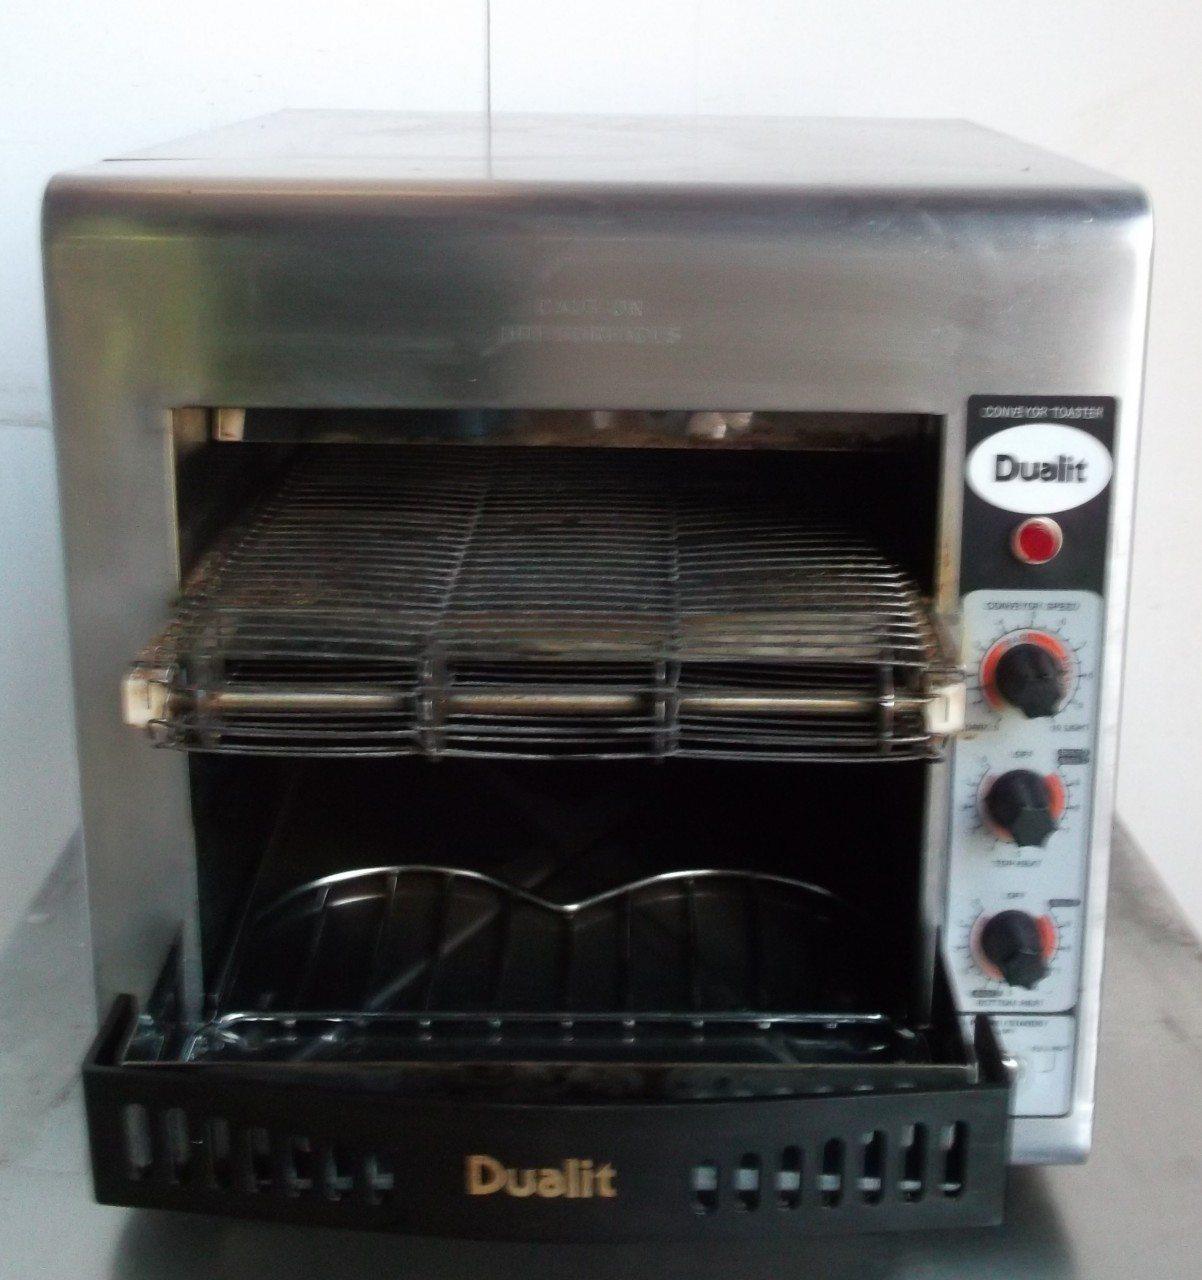 Dualit Conveyor Toaster